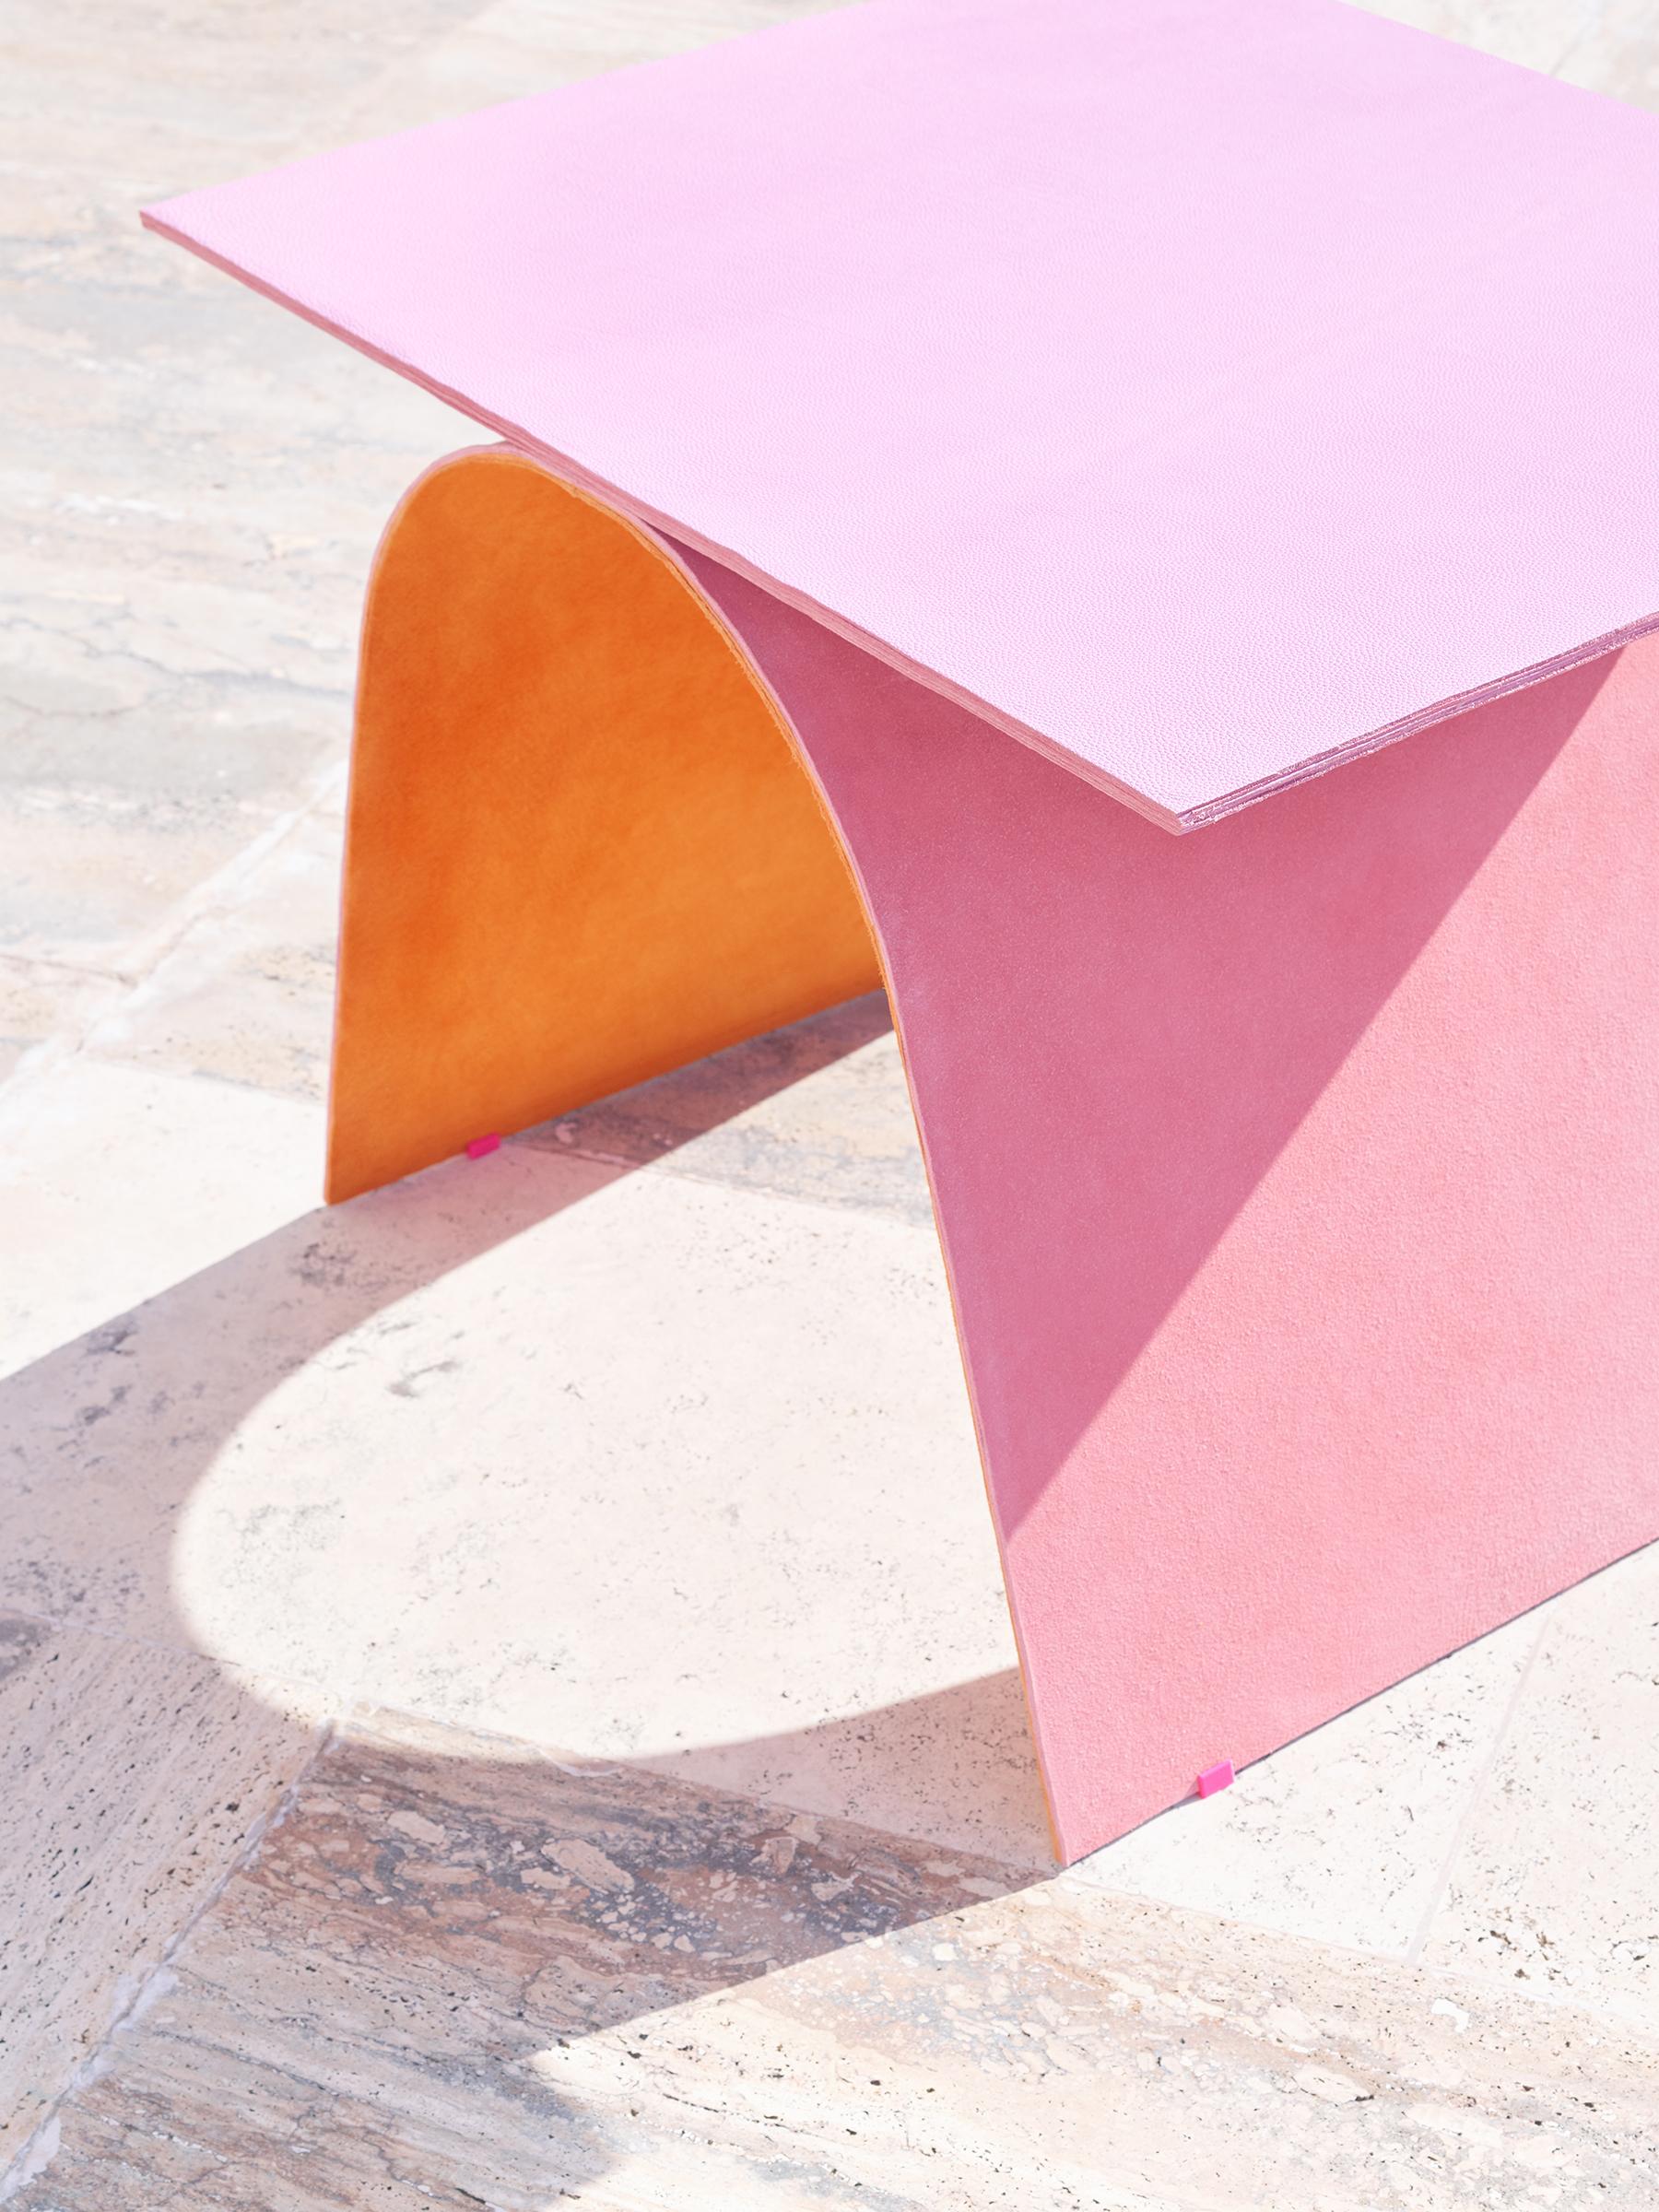 Fendi Debuts 'Roman Molds' by Kueng Caputo at Design Miami